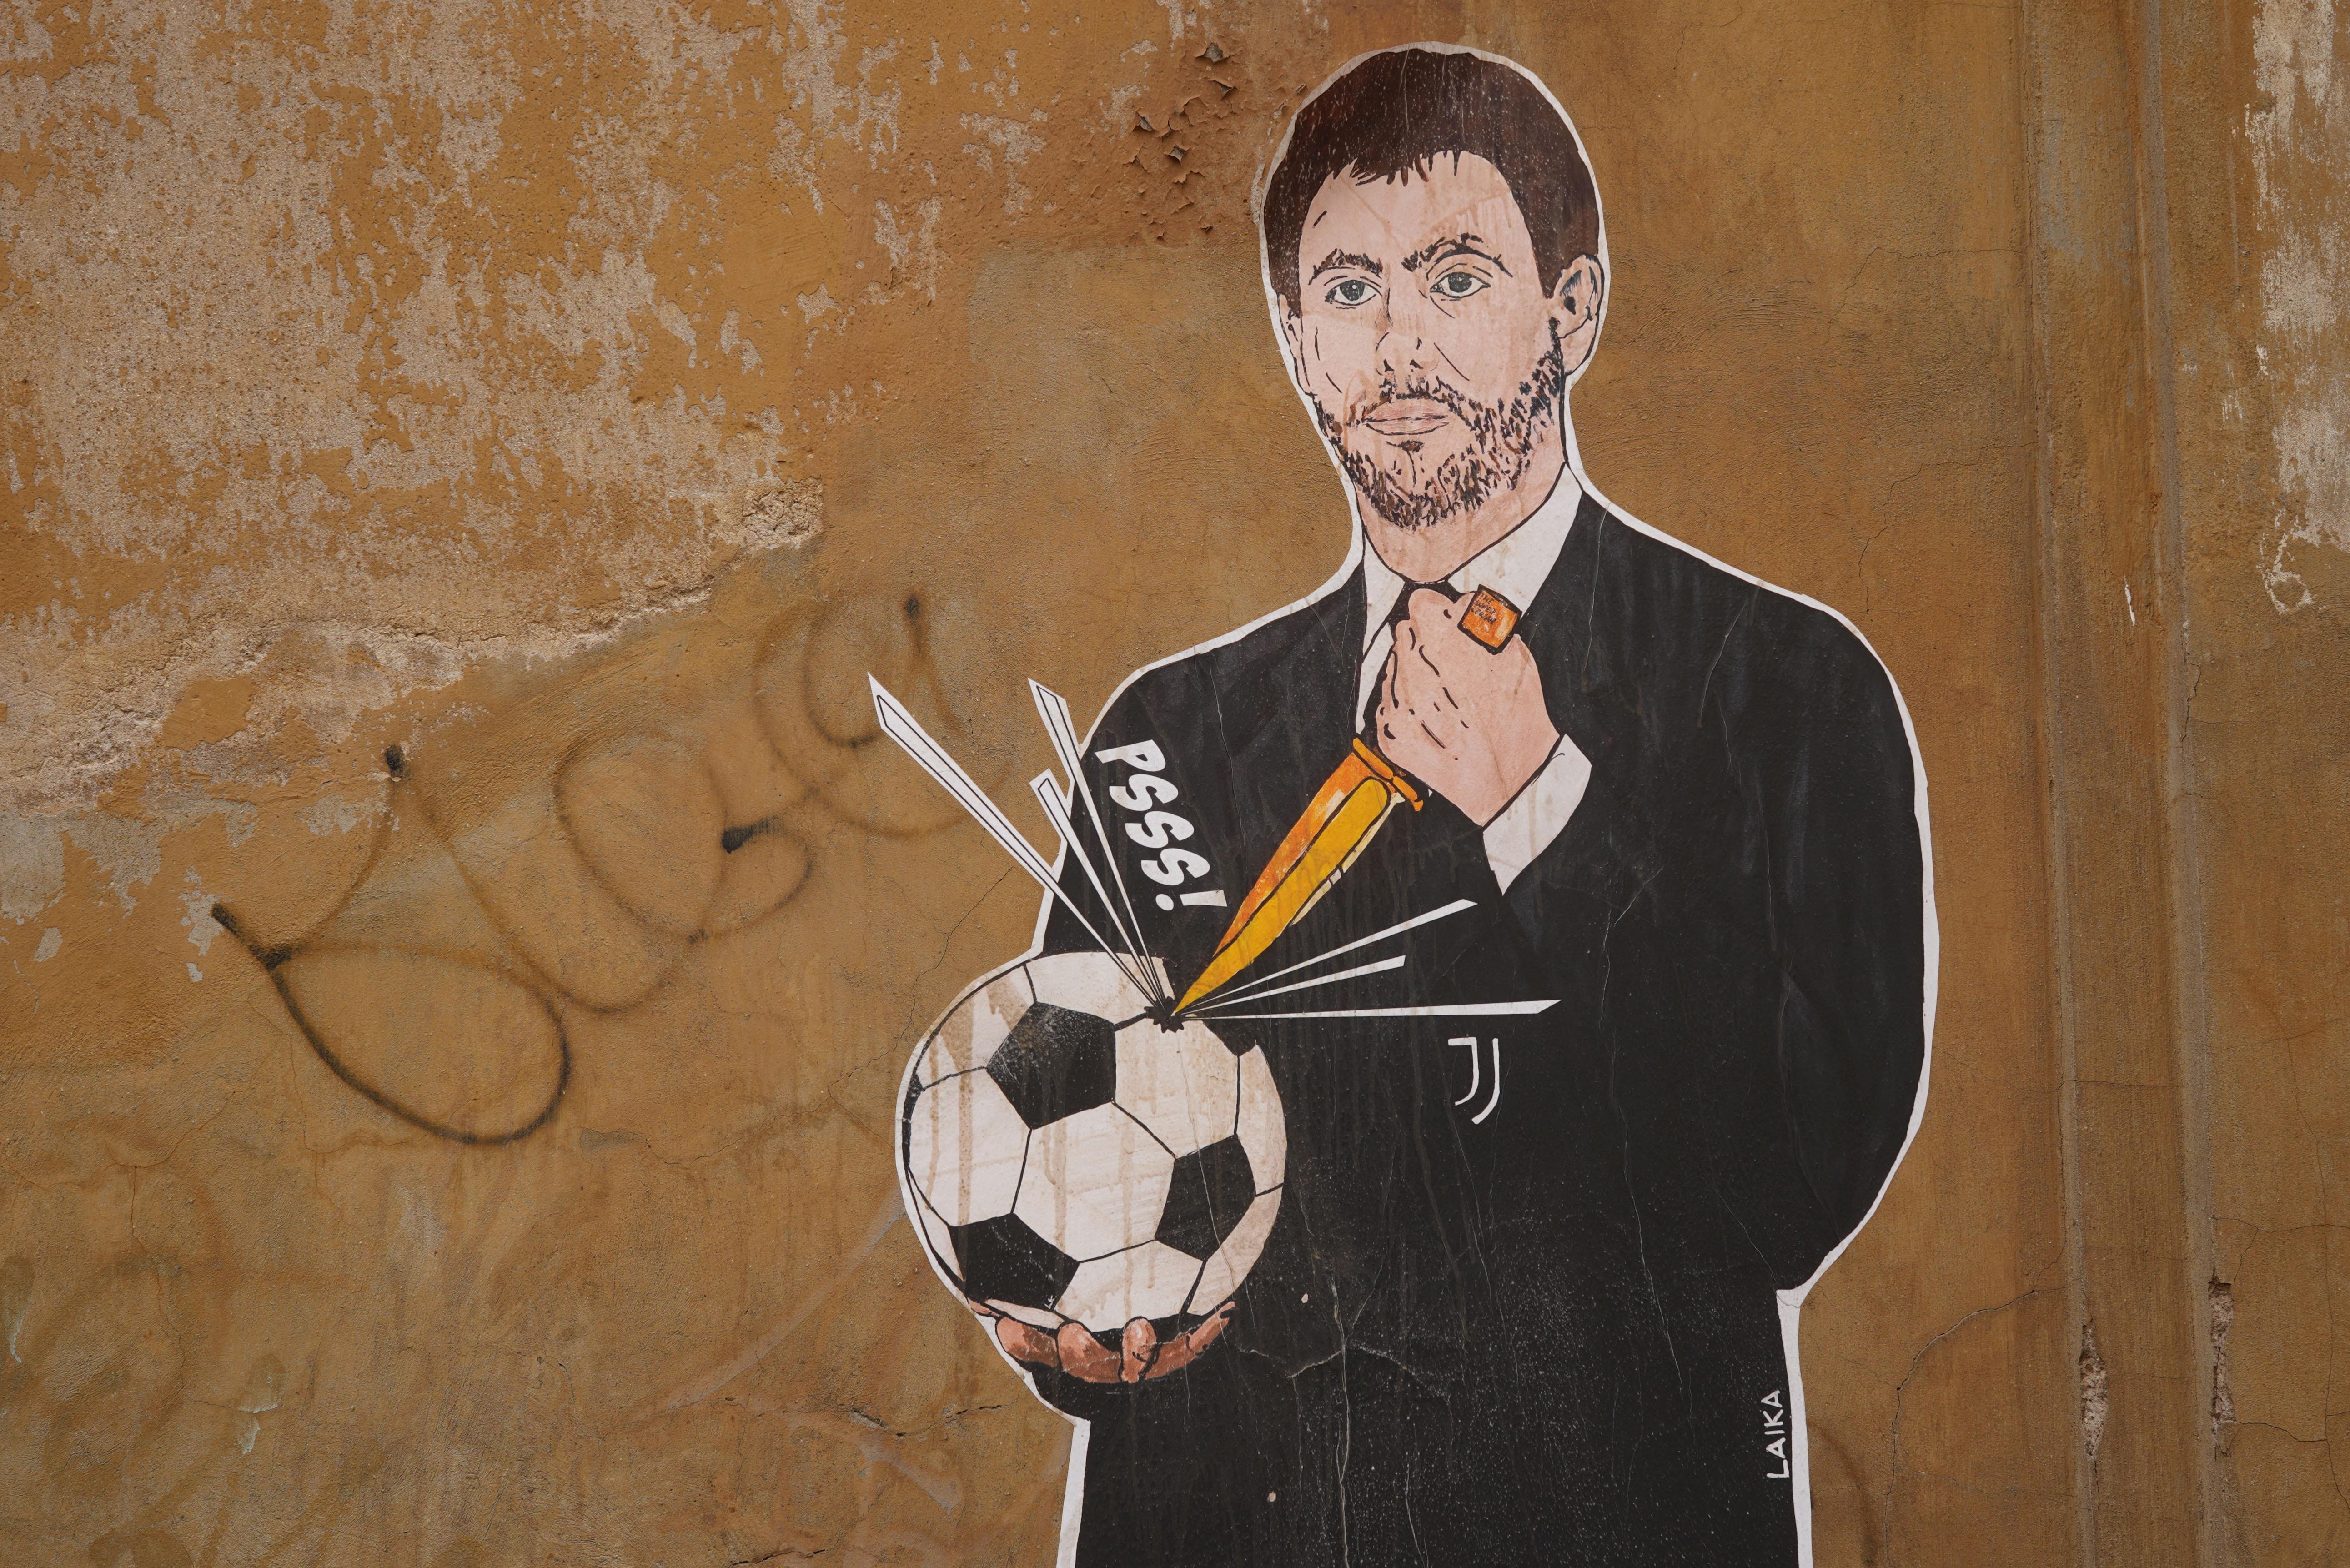 Un Mural de Agnelli, presidente de la Juve